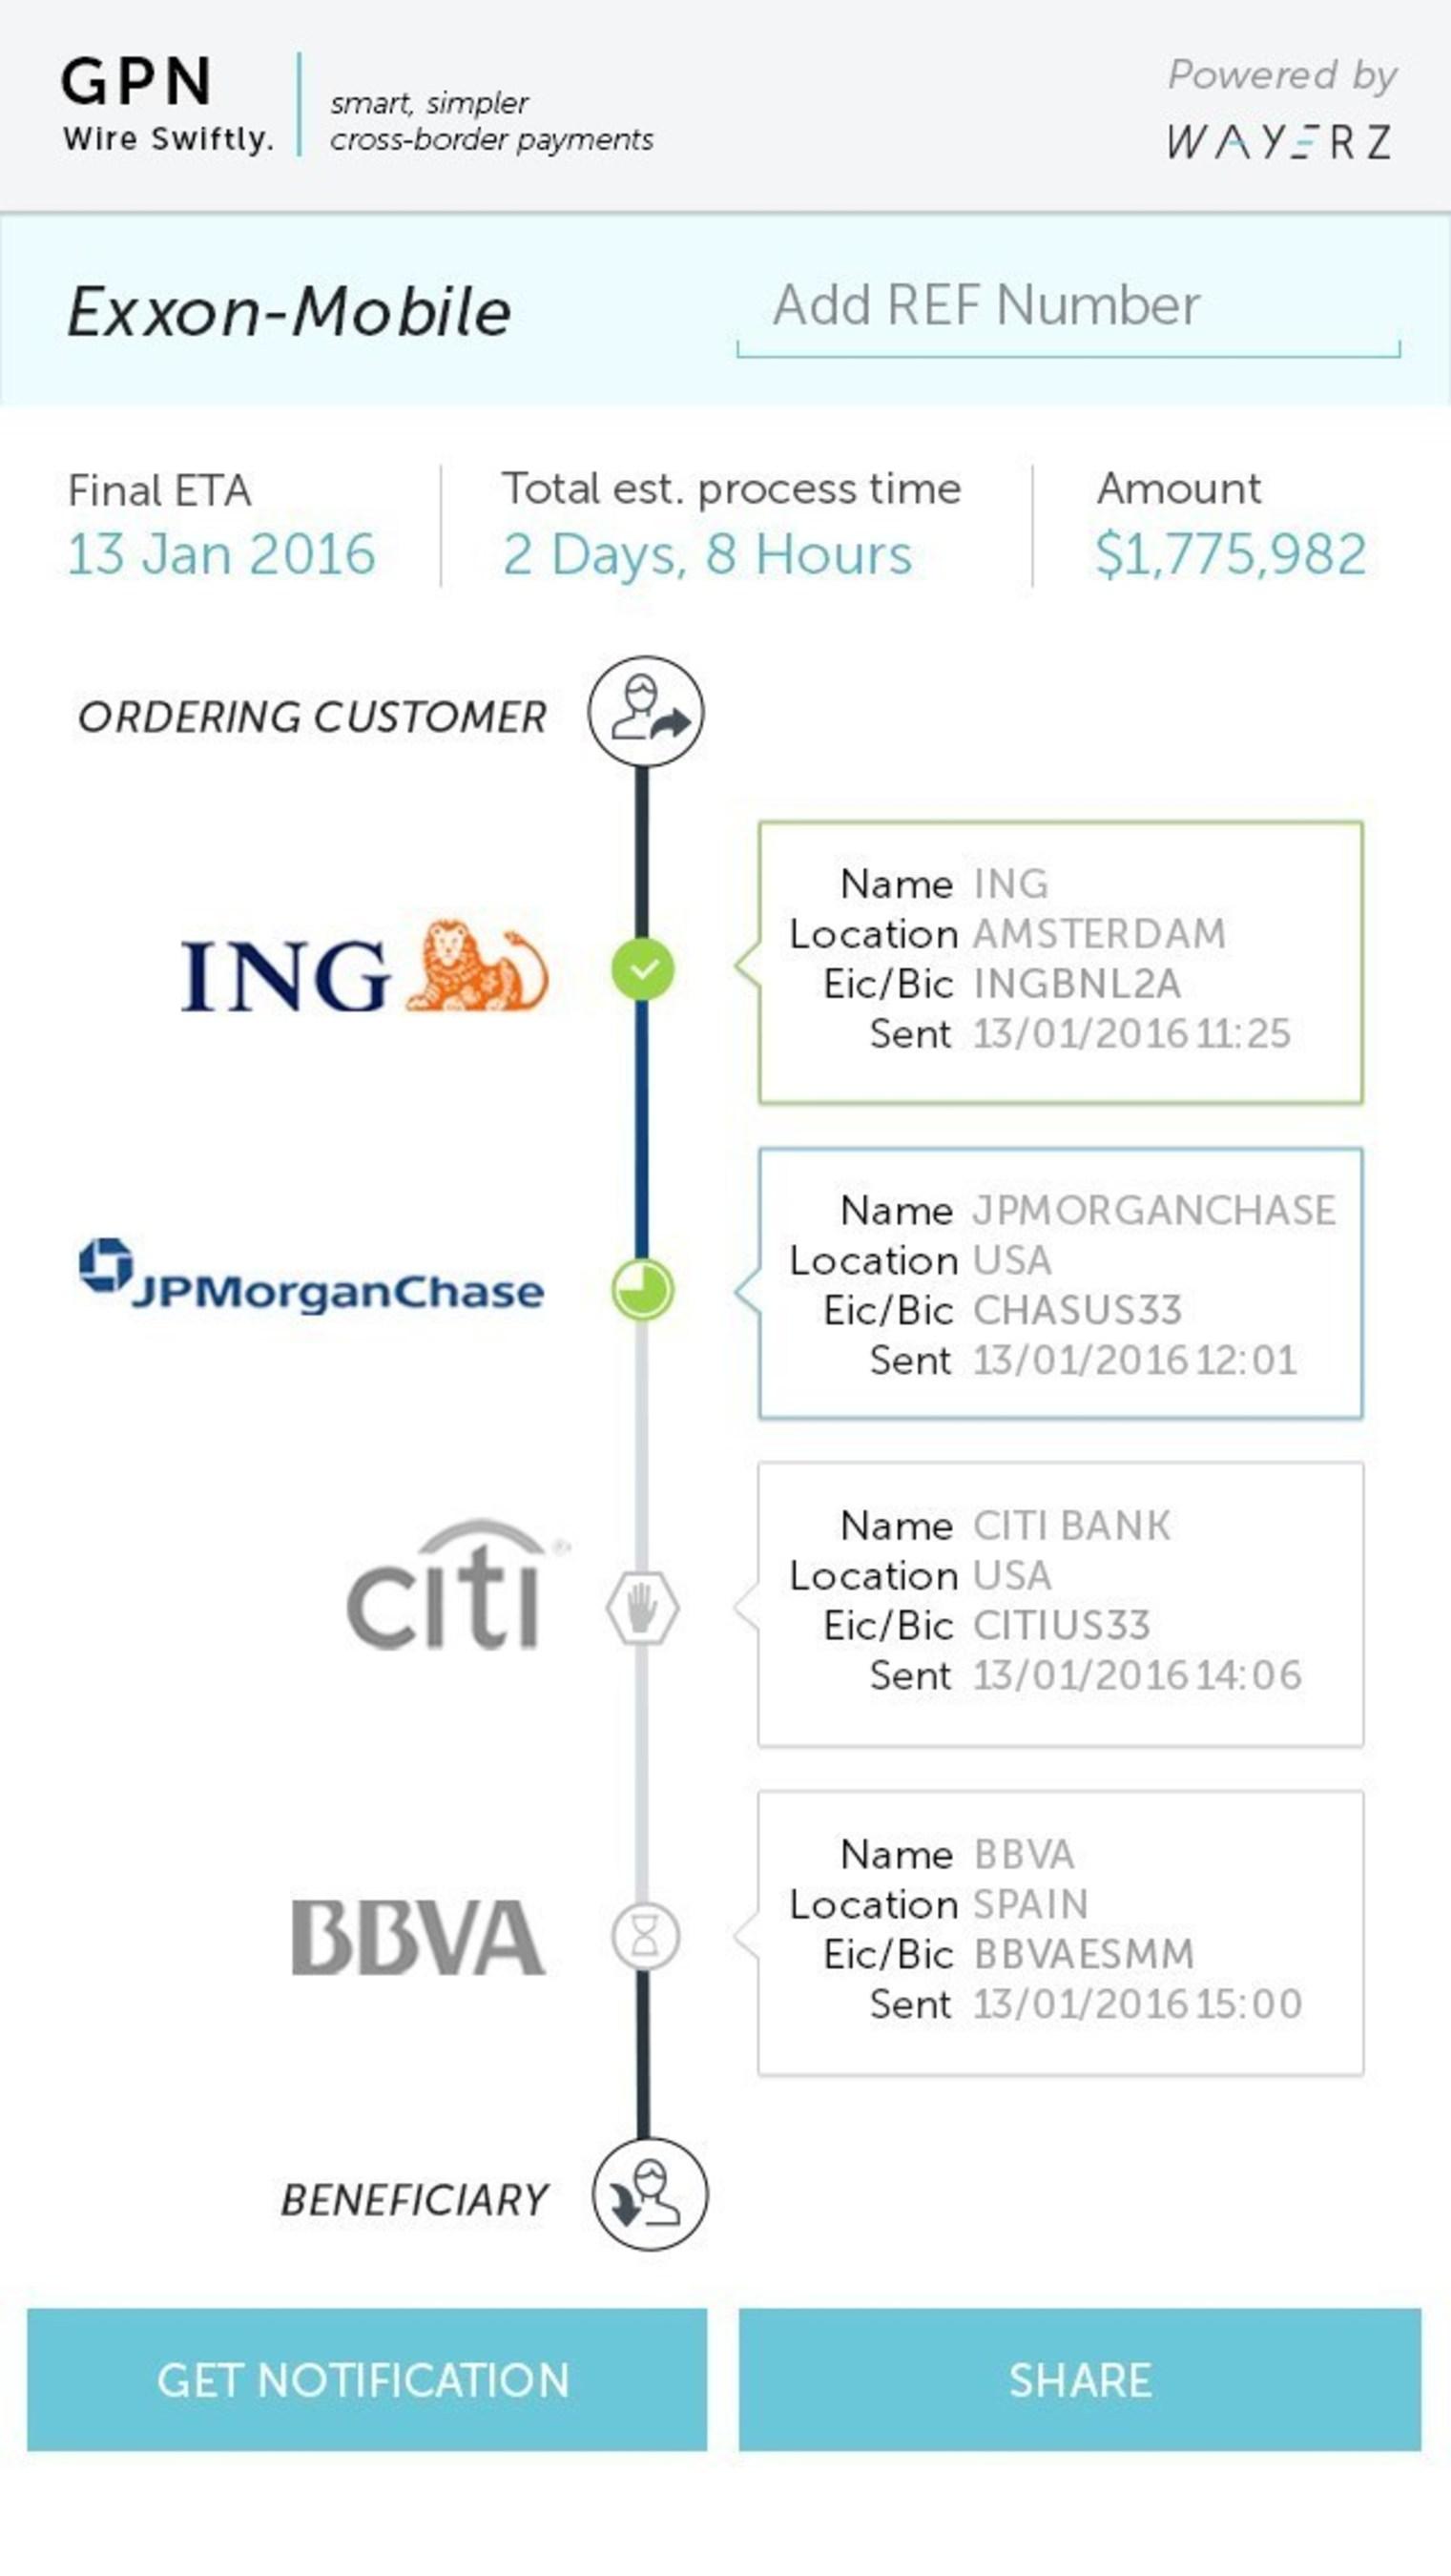 Wayerz Global Payment Network